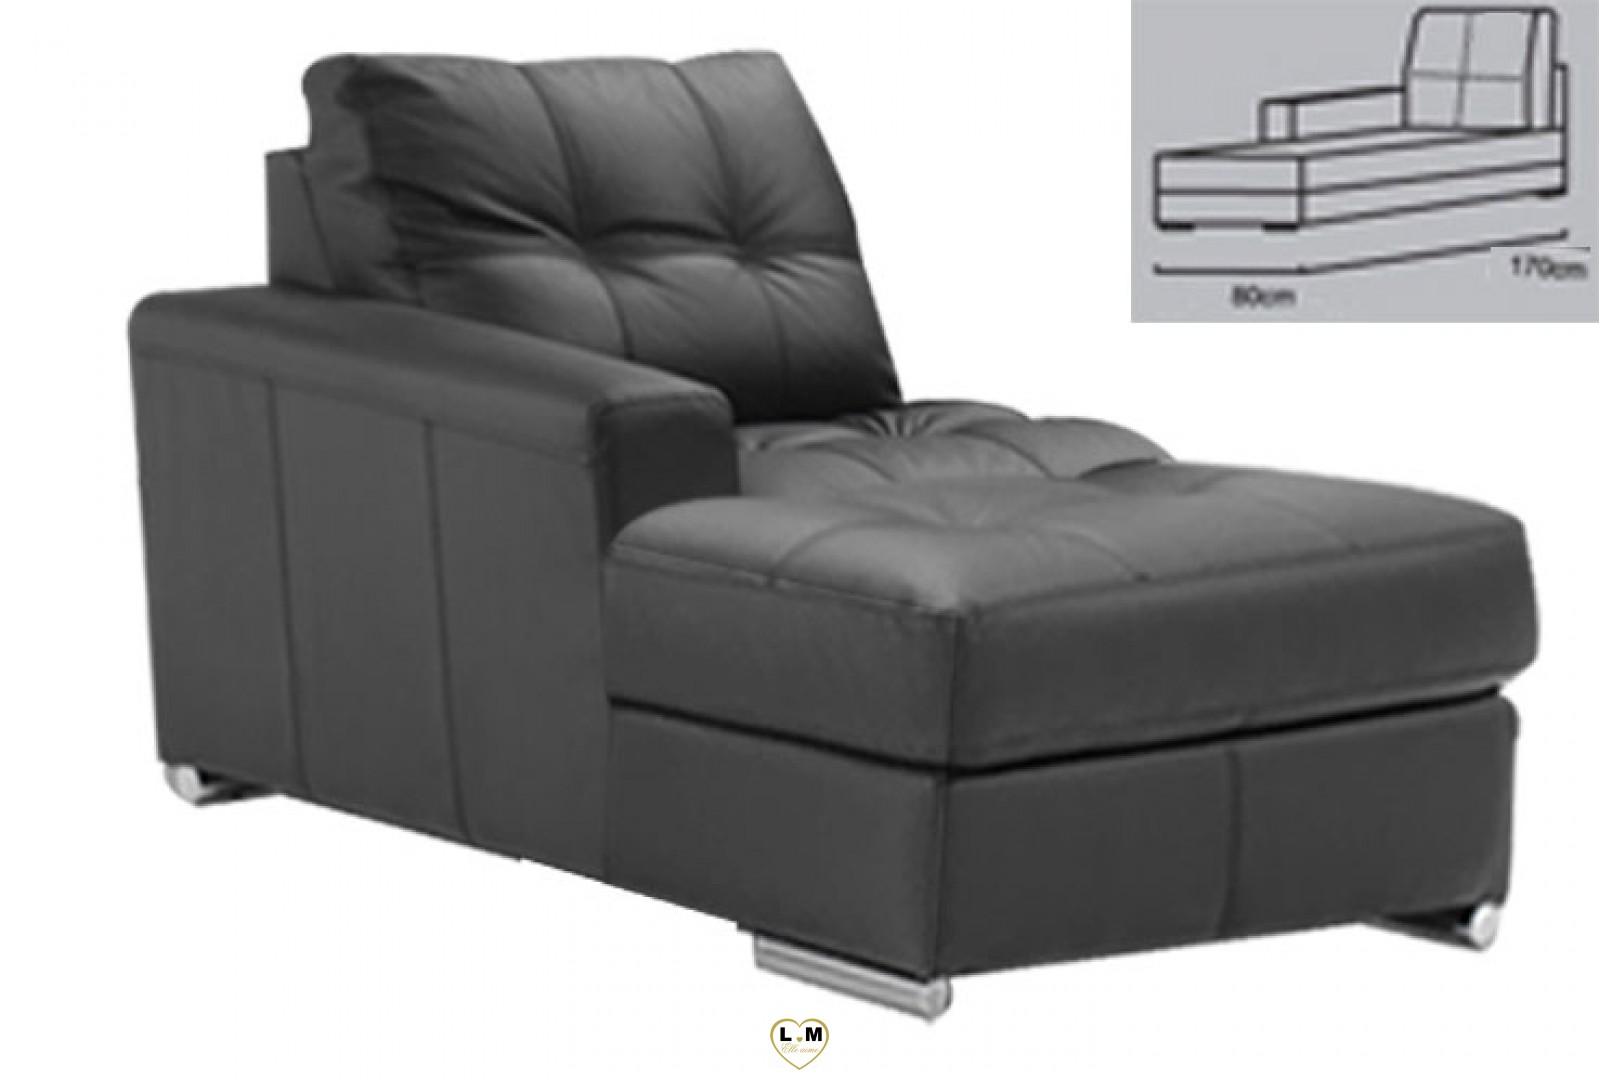 Alexie angle salon cuir la chaise longue gauche for Chaise 87 cm